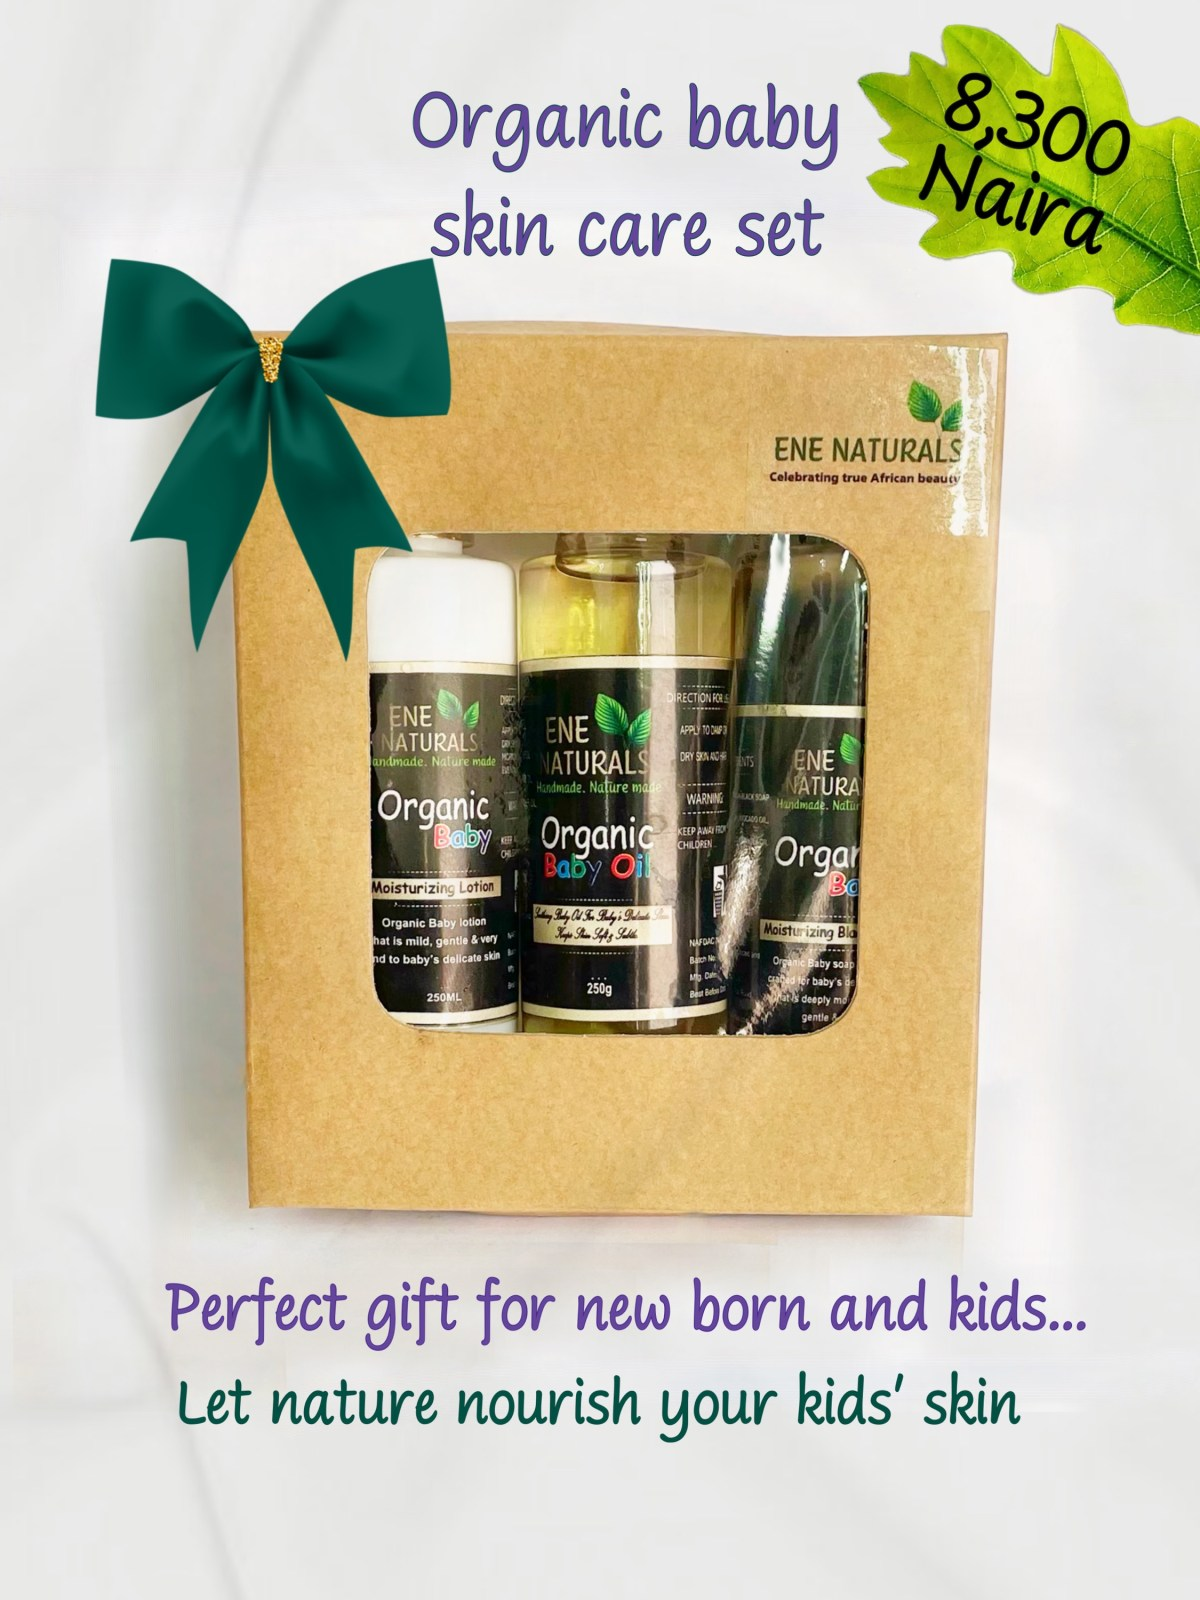 Organic baby skincare gift set